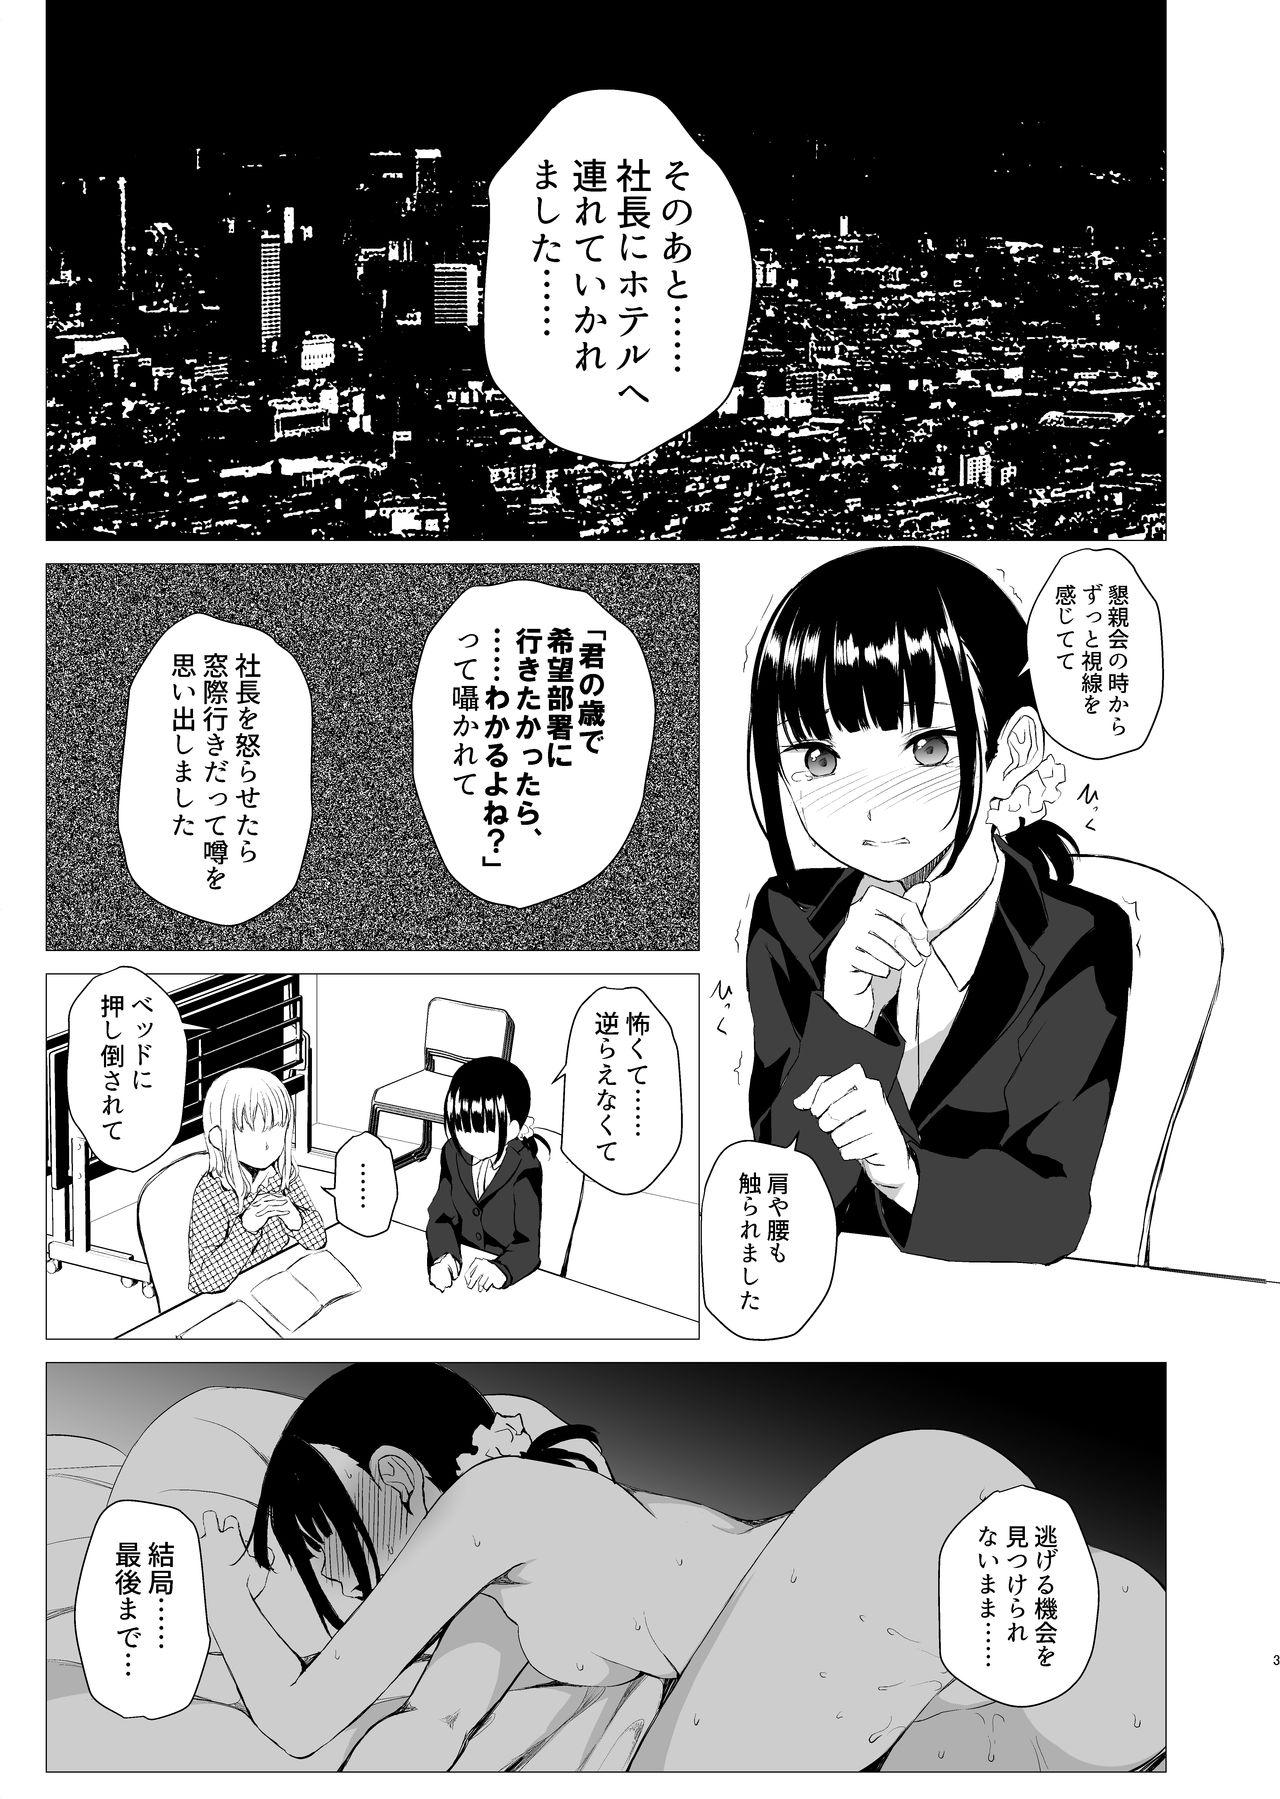 Hanayomi no Makurakotoba 1